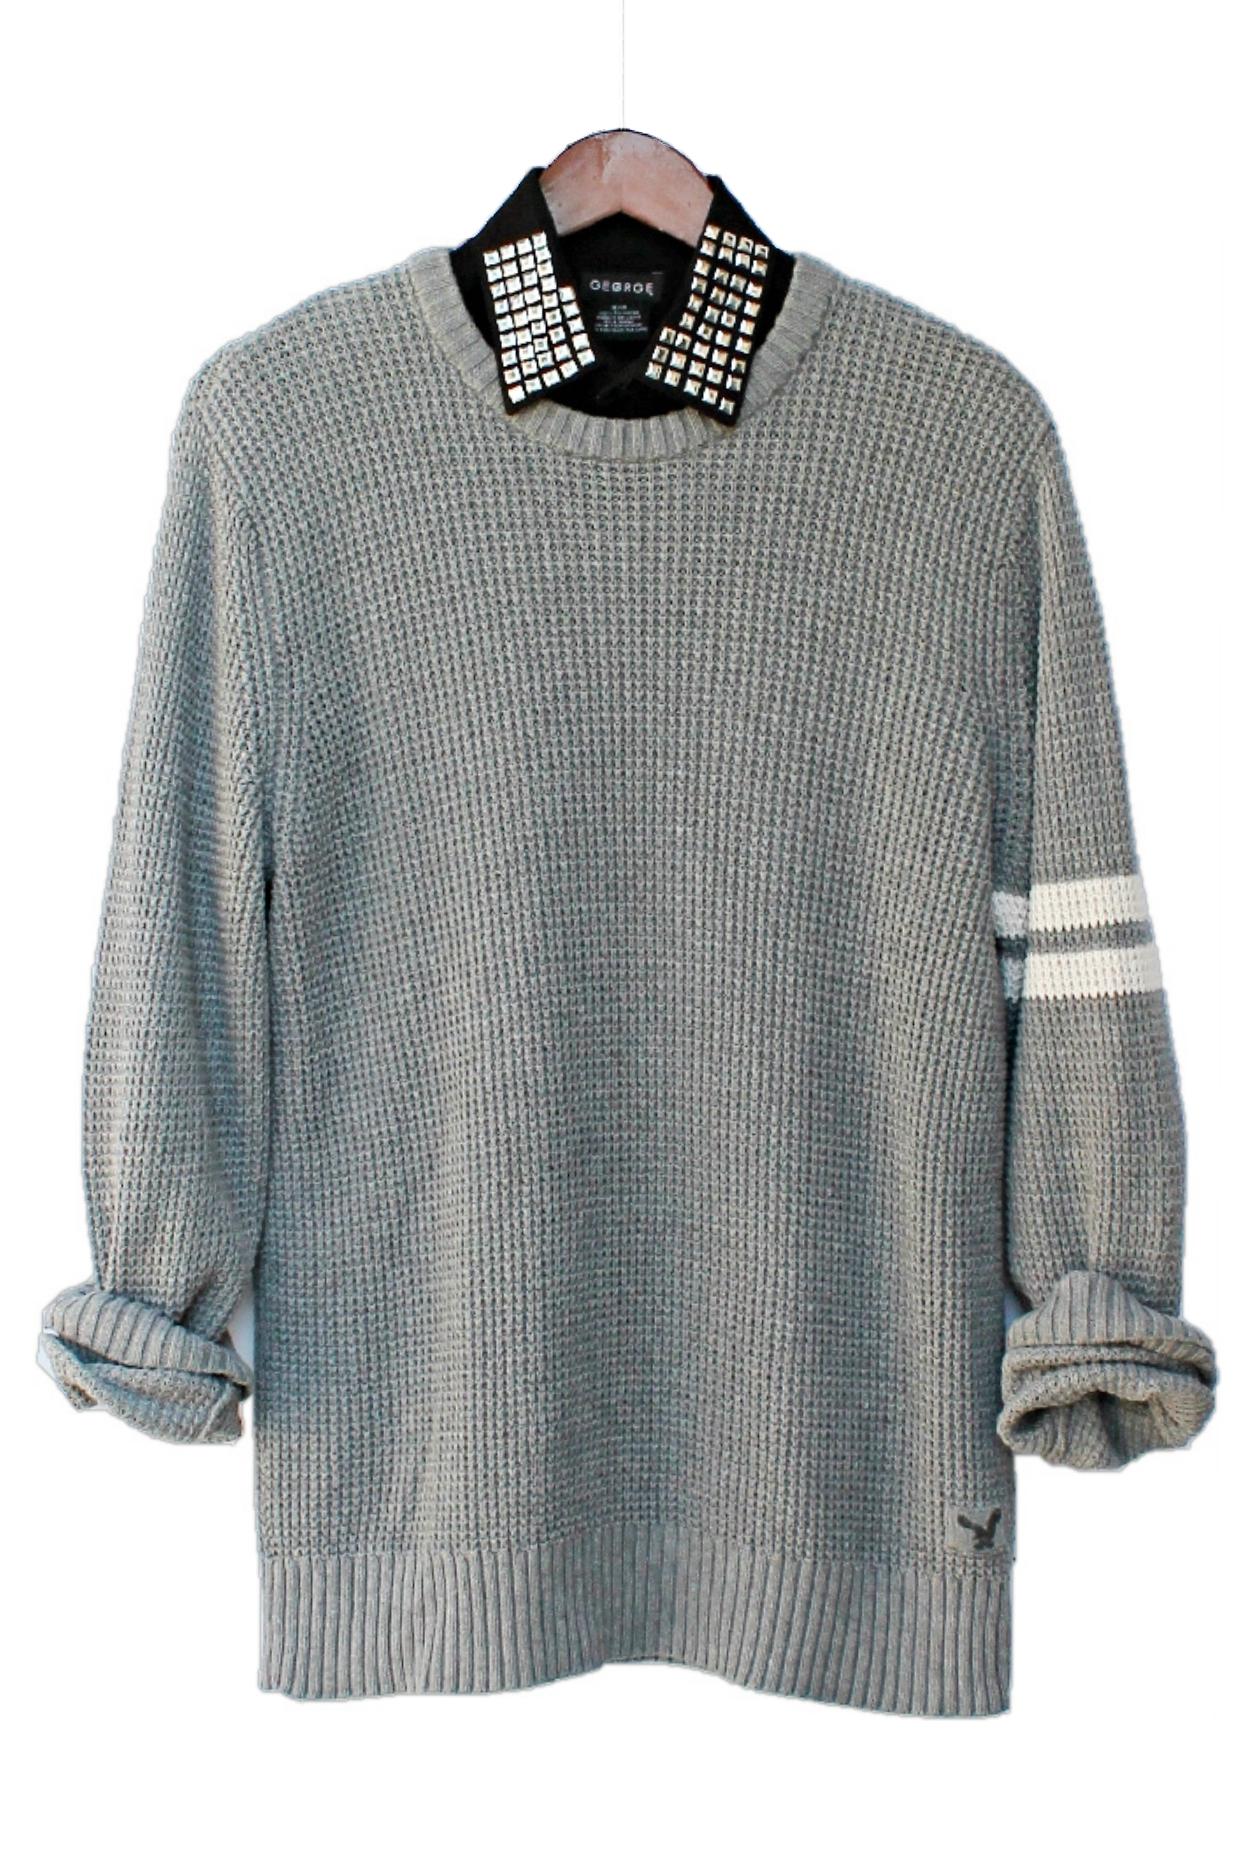 The Not So Boring Sweater | Just Vu